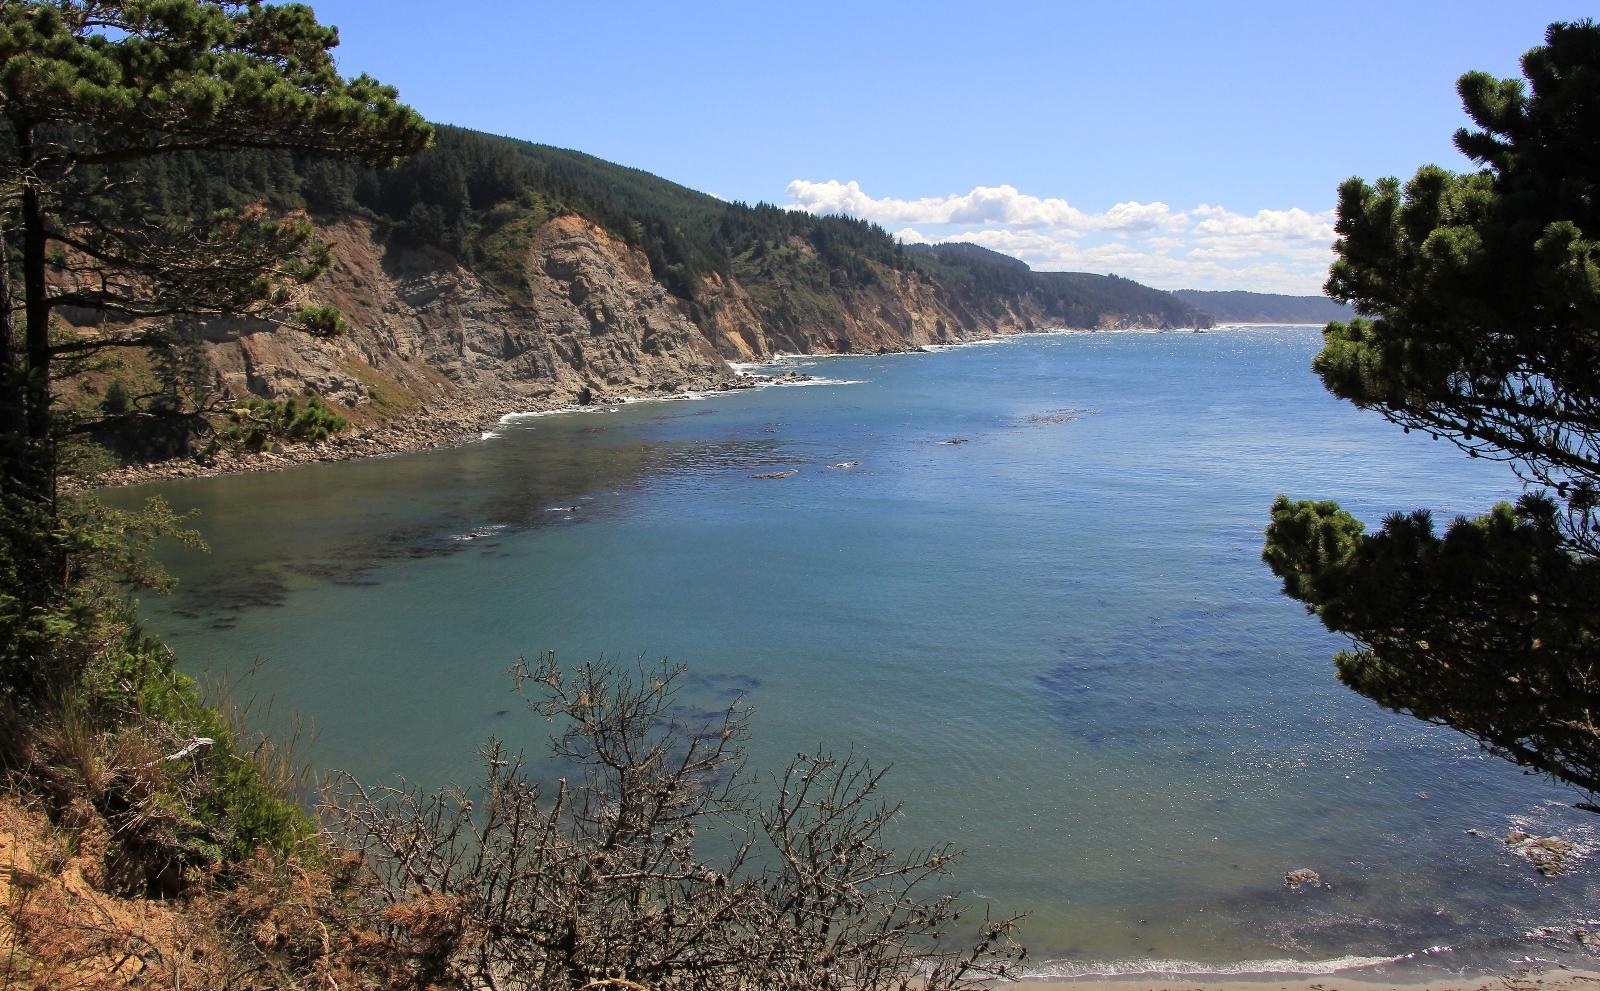 09-04-16-oregon-coast-shore-acres-150